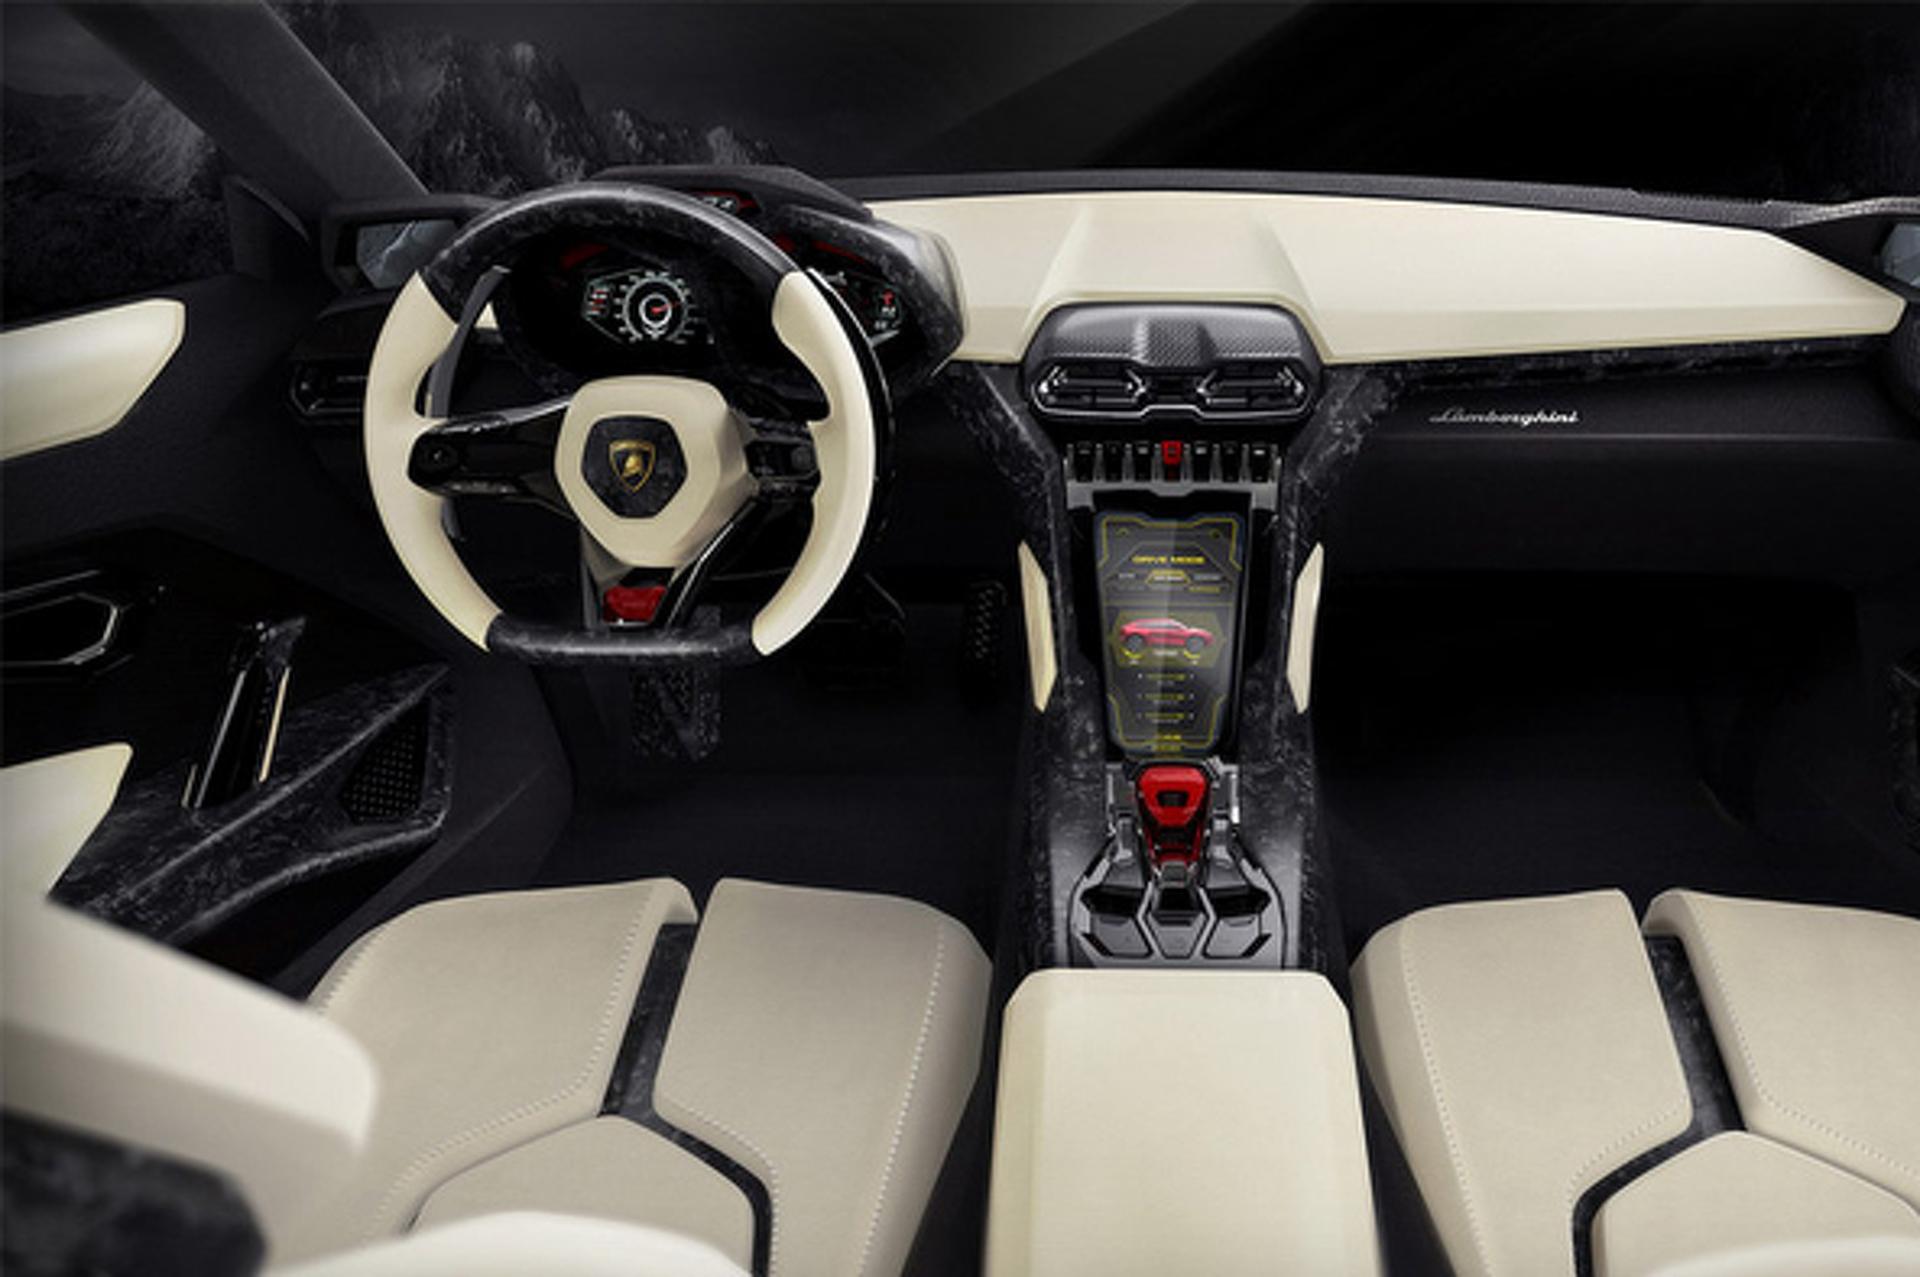 Spied Ride: Lamborghini Urus SUV